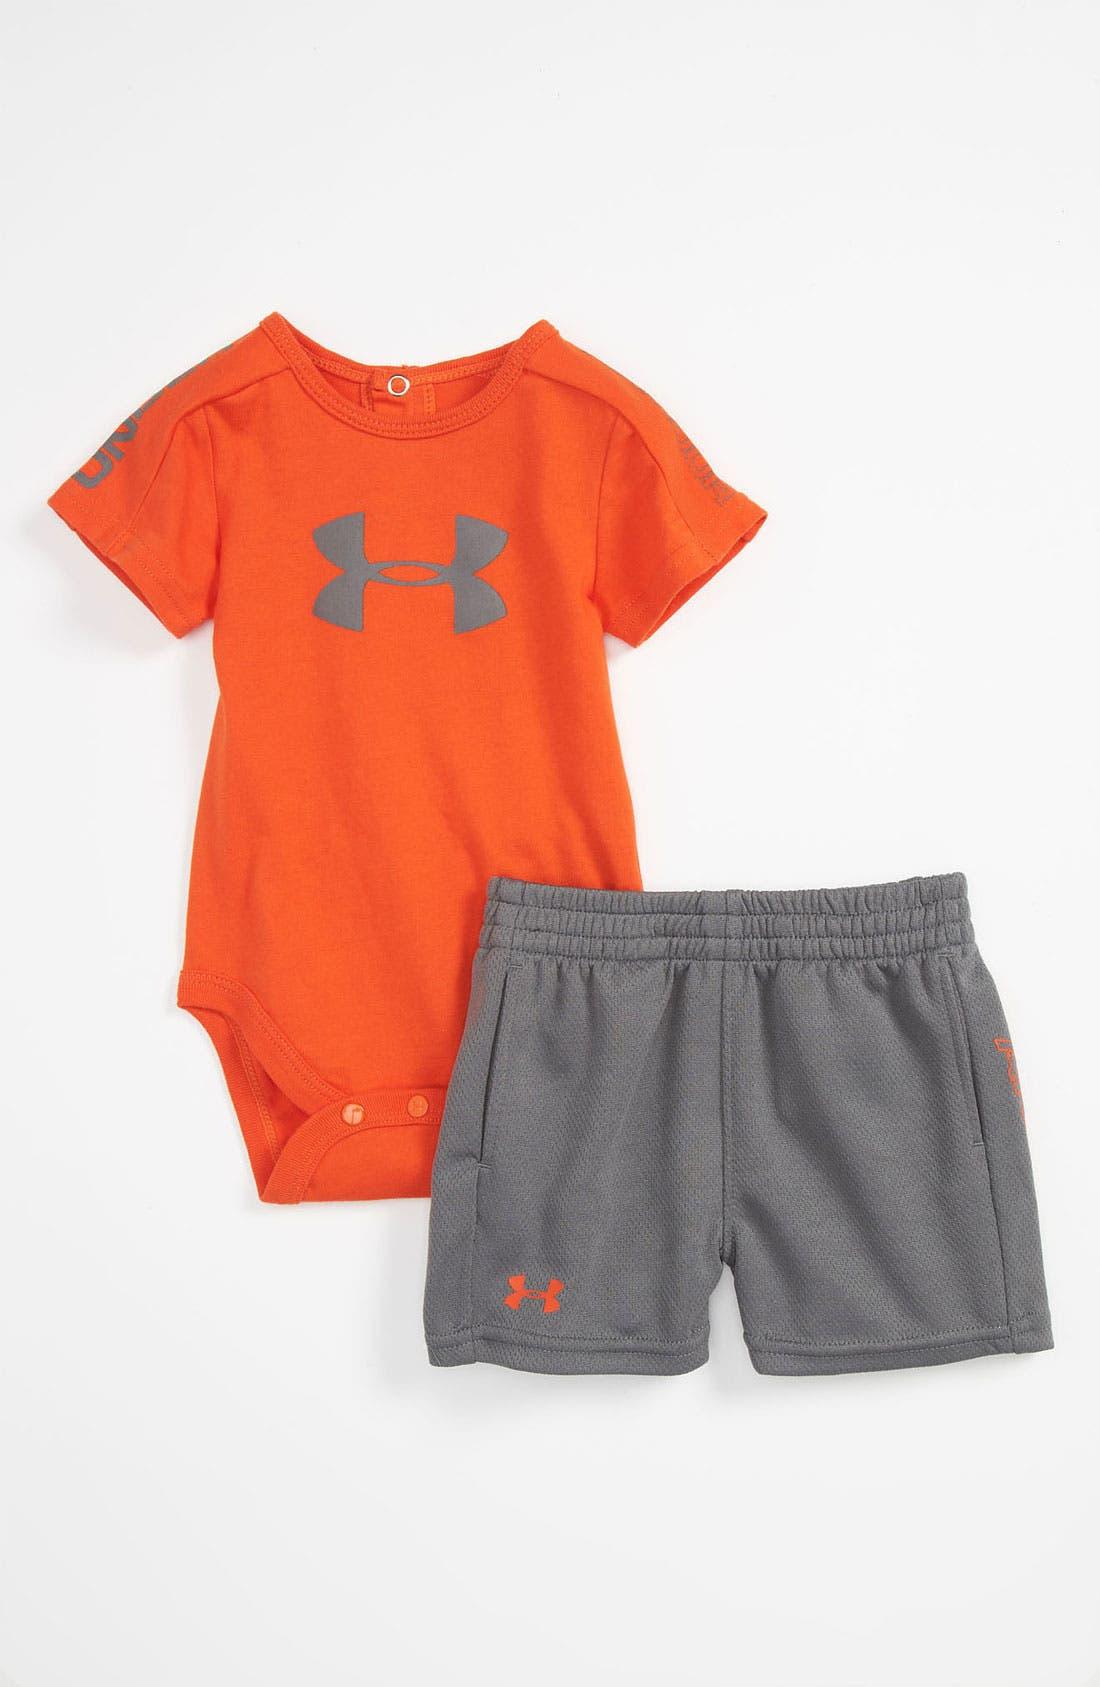 Alternate Image 1 Selected - Under Armour 'Integrity 2.0' Bodysuit & Shorts (Infant)